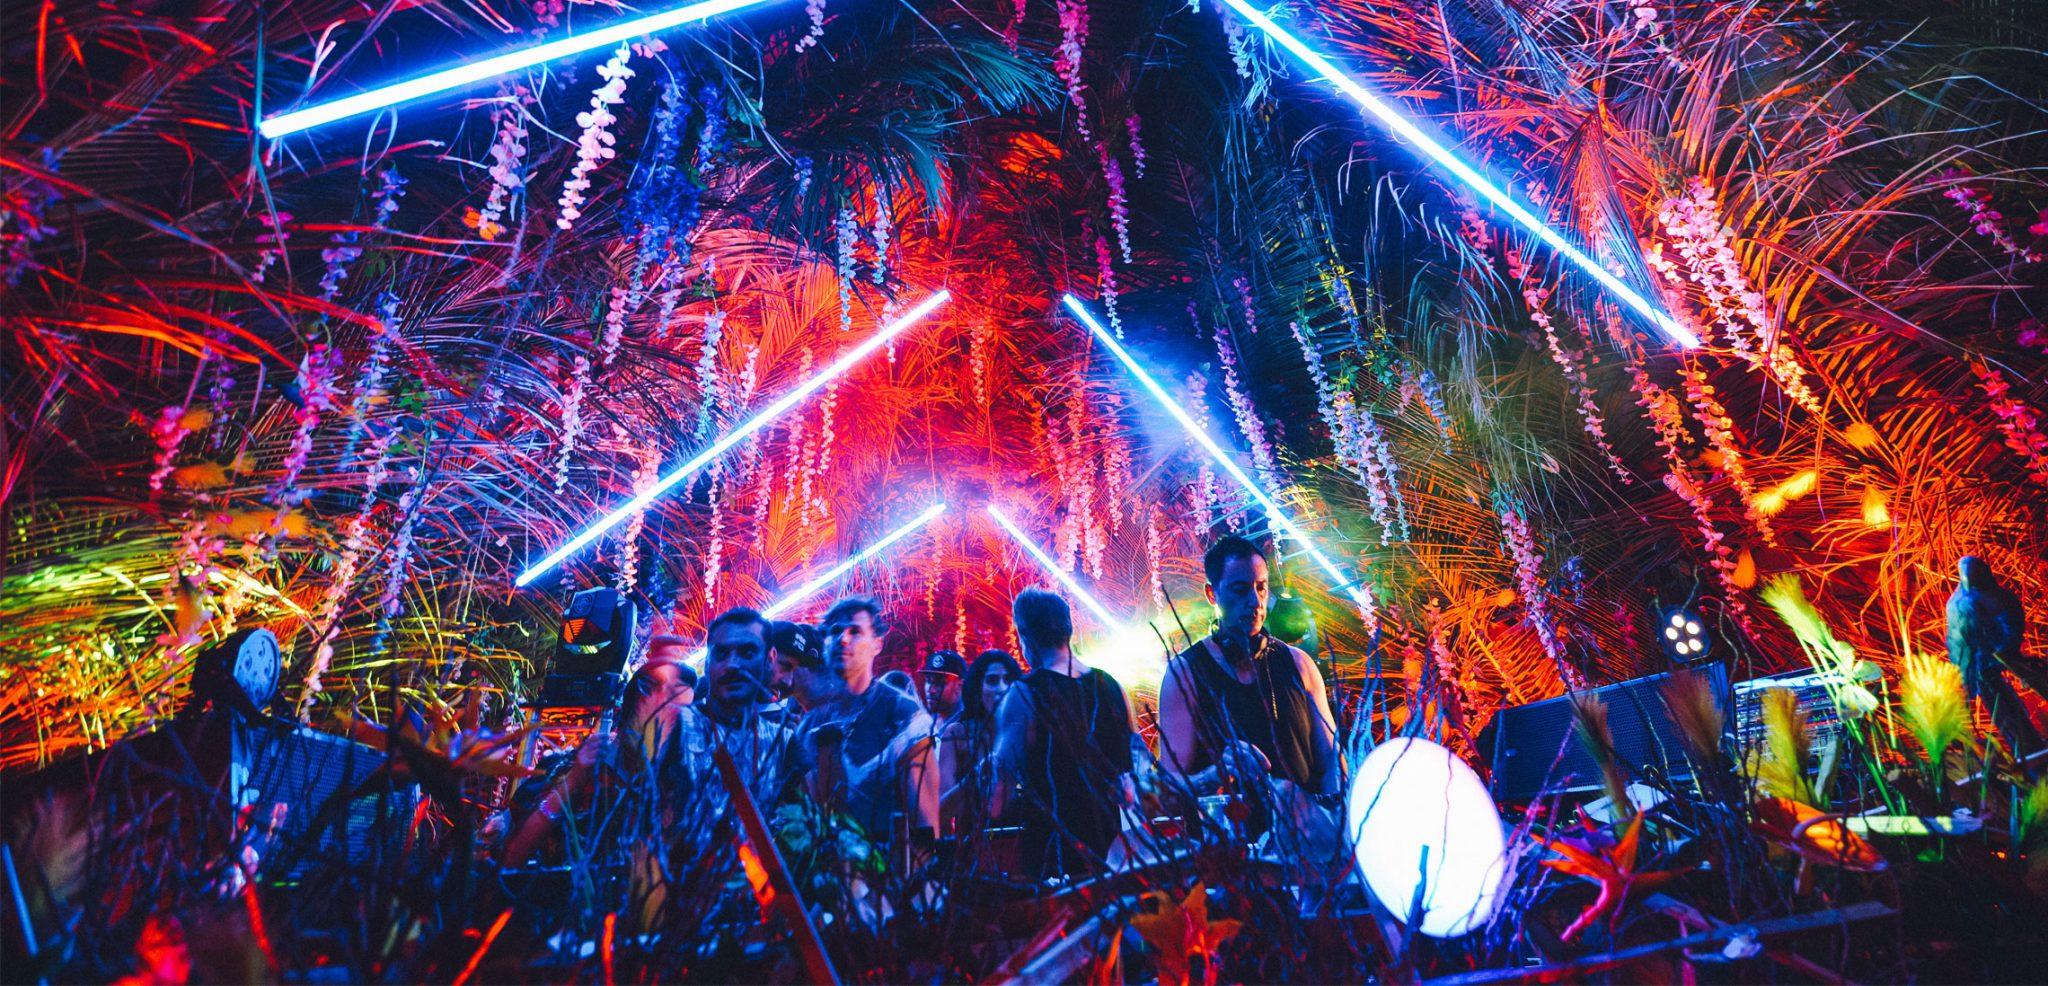 SXM Festival on the Caribbean Island of Saint Martin Announces Phase 2